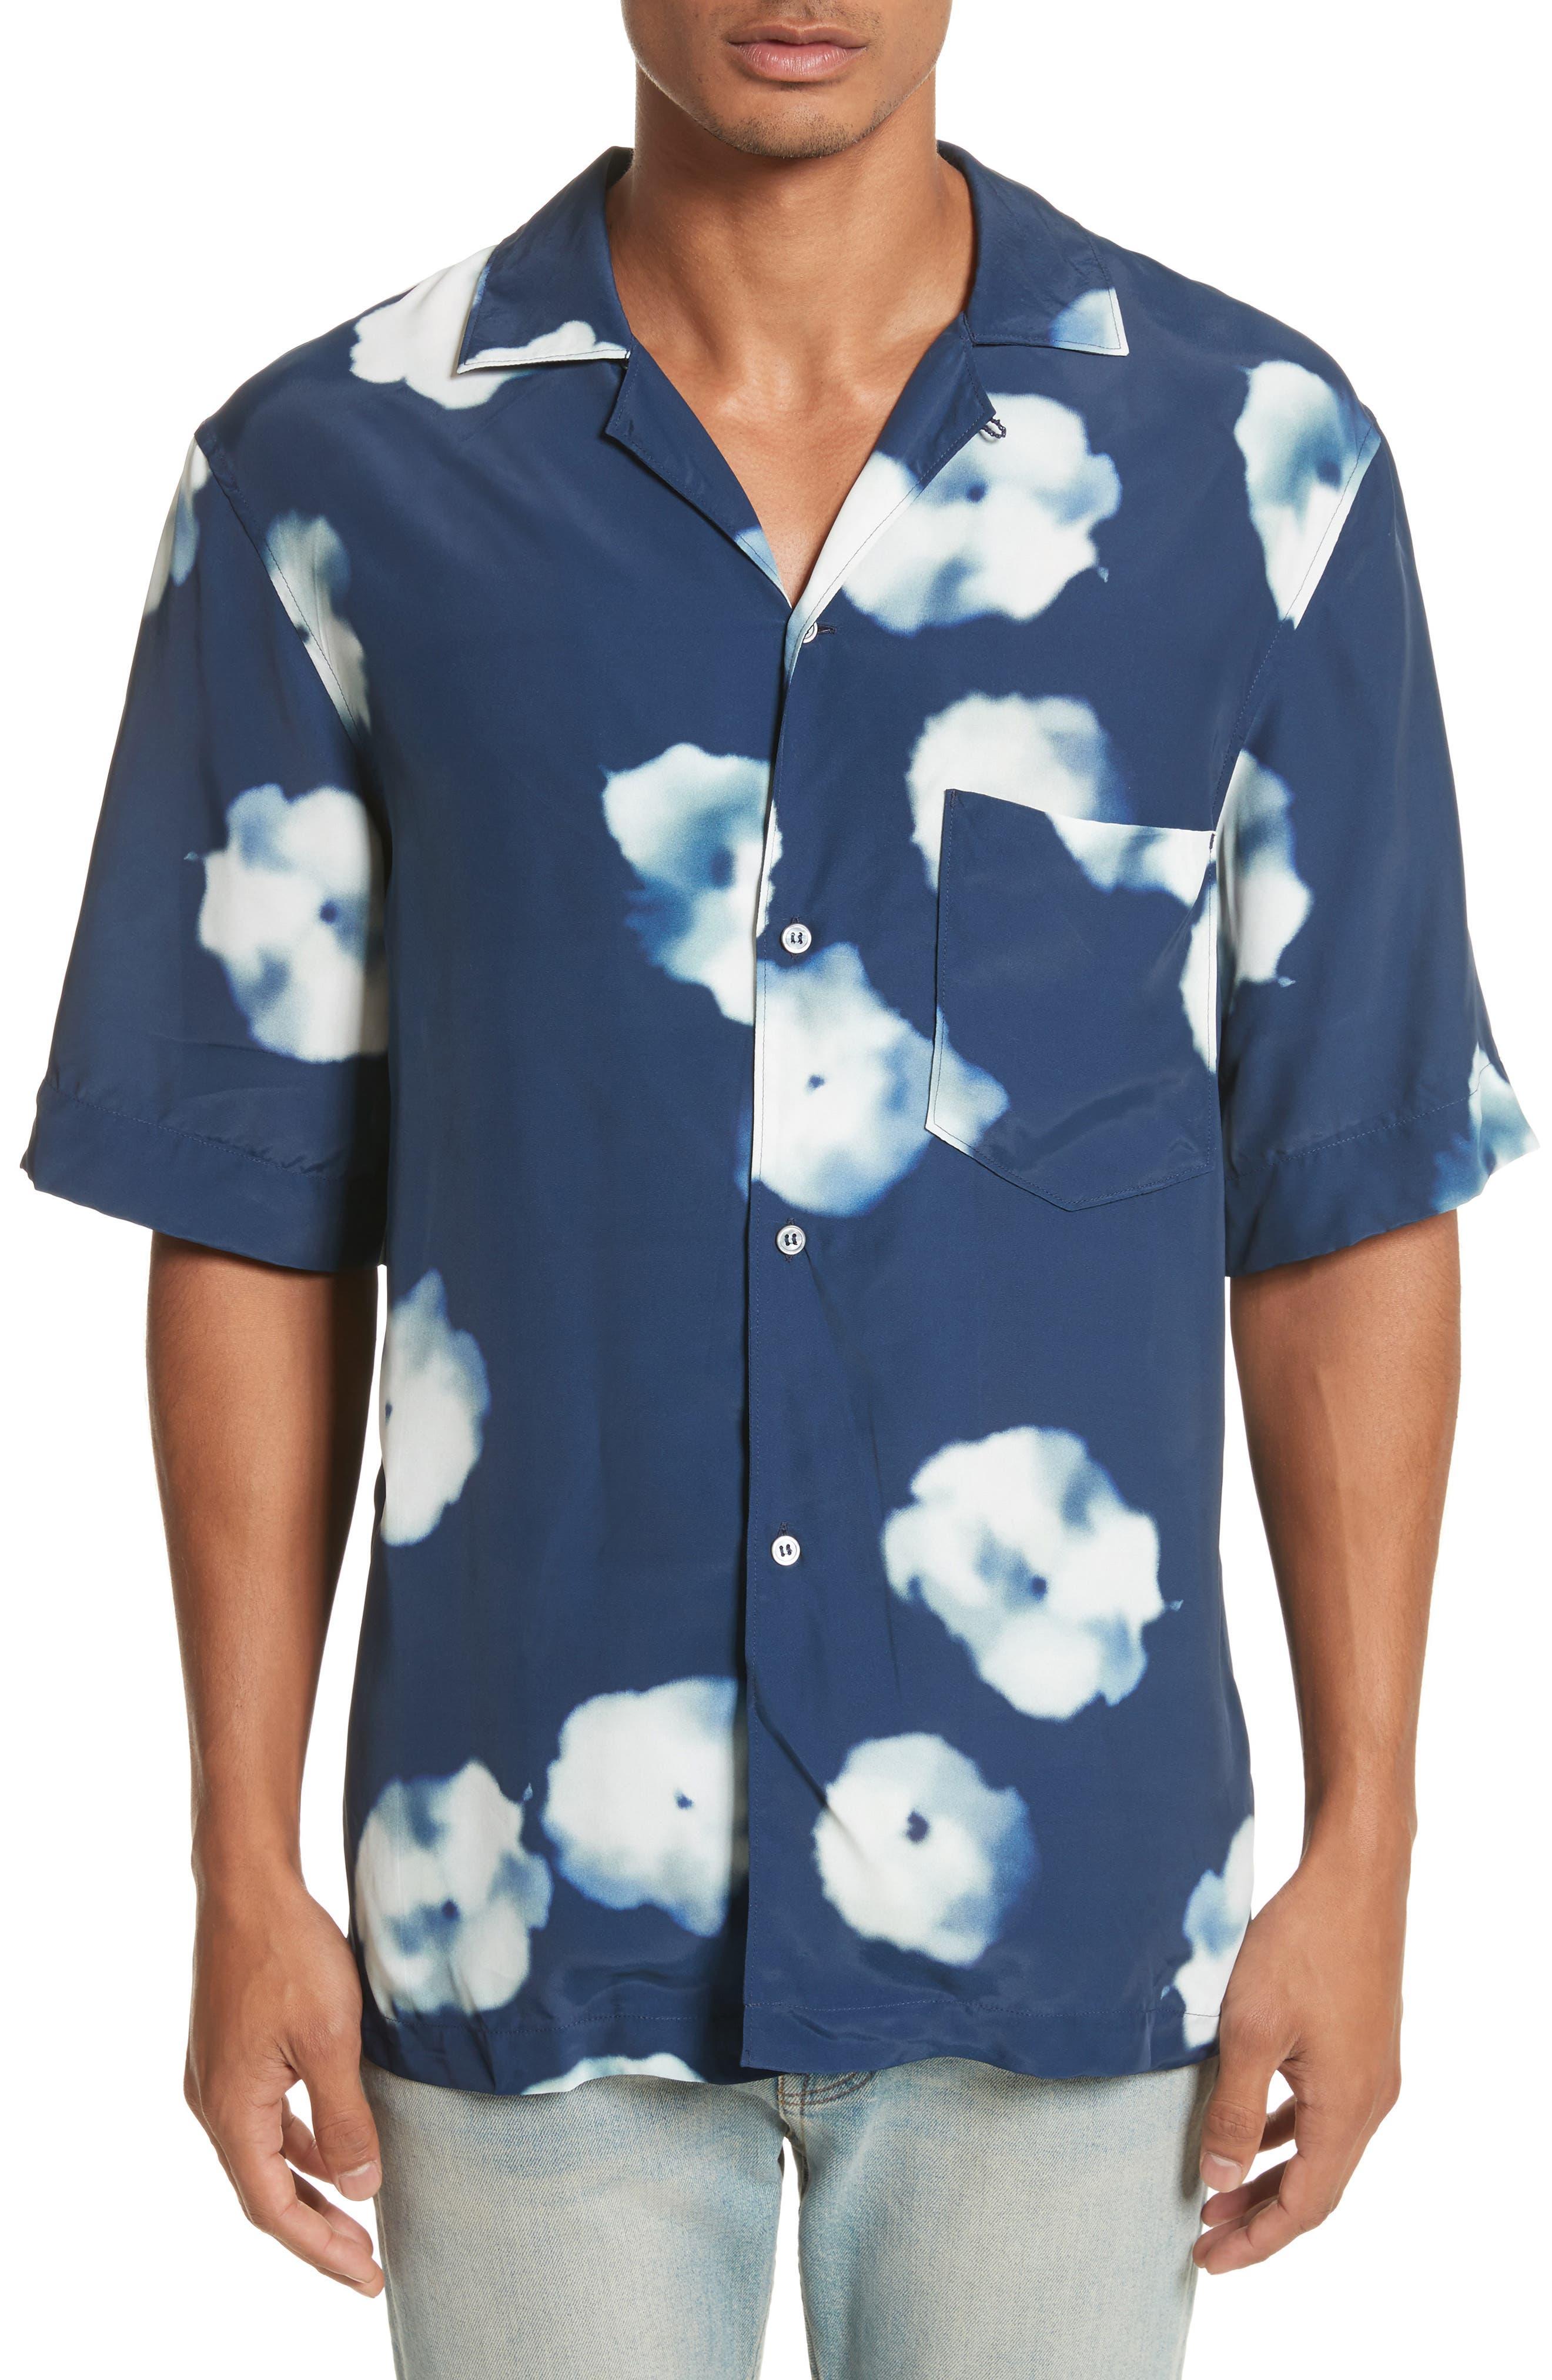 Acne Studios Elms Flower Print Shirt